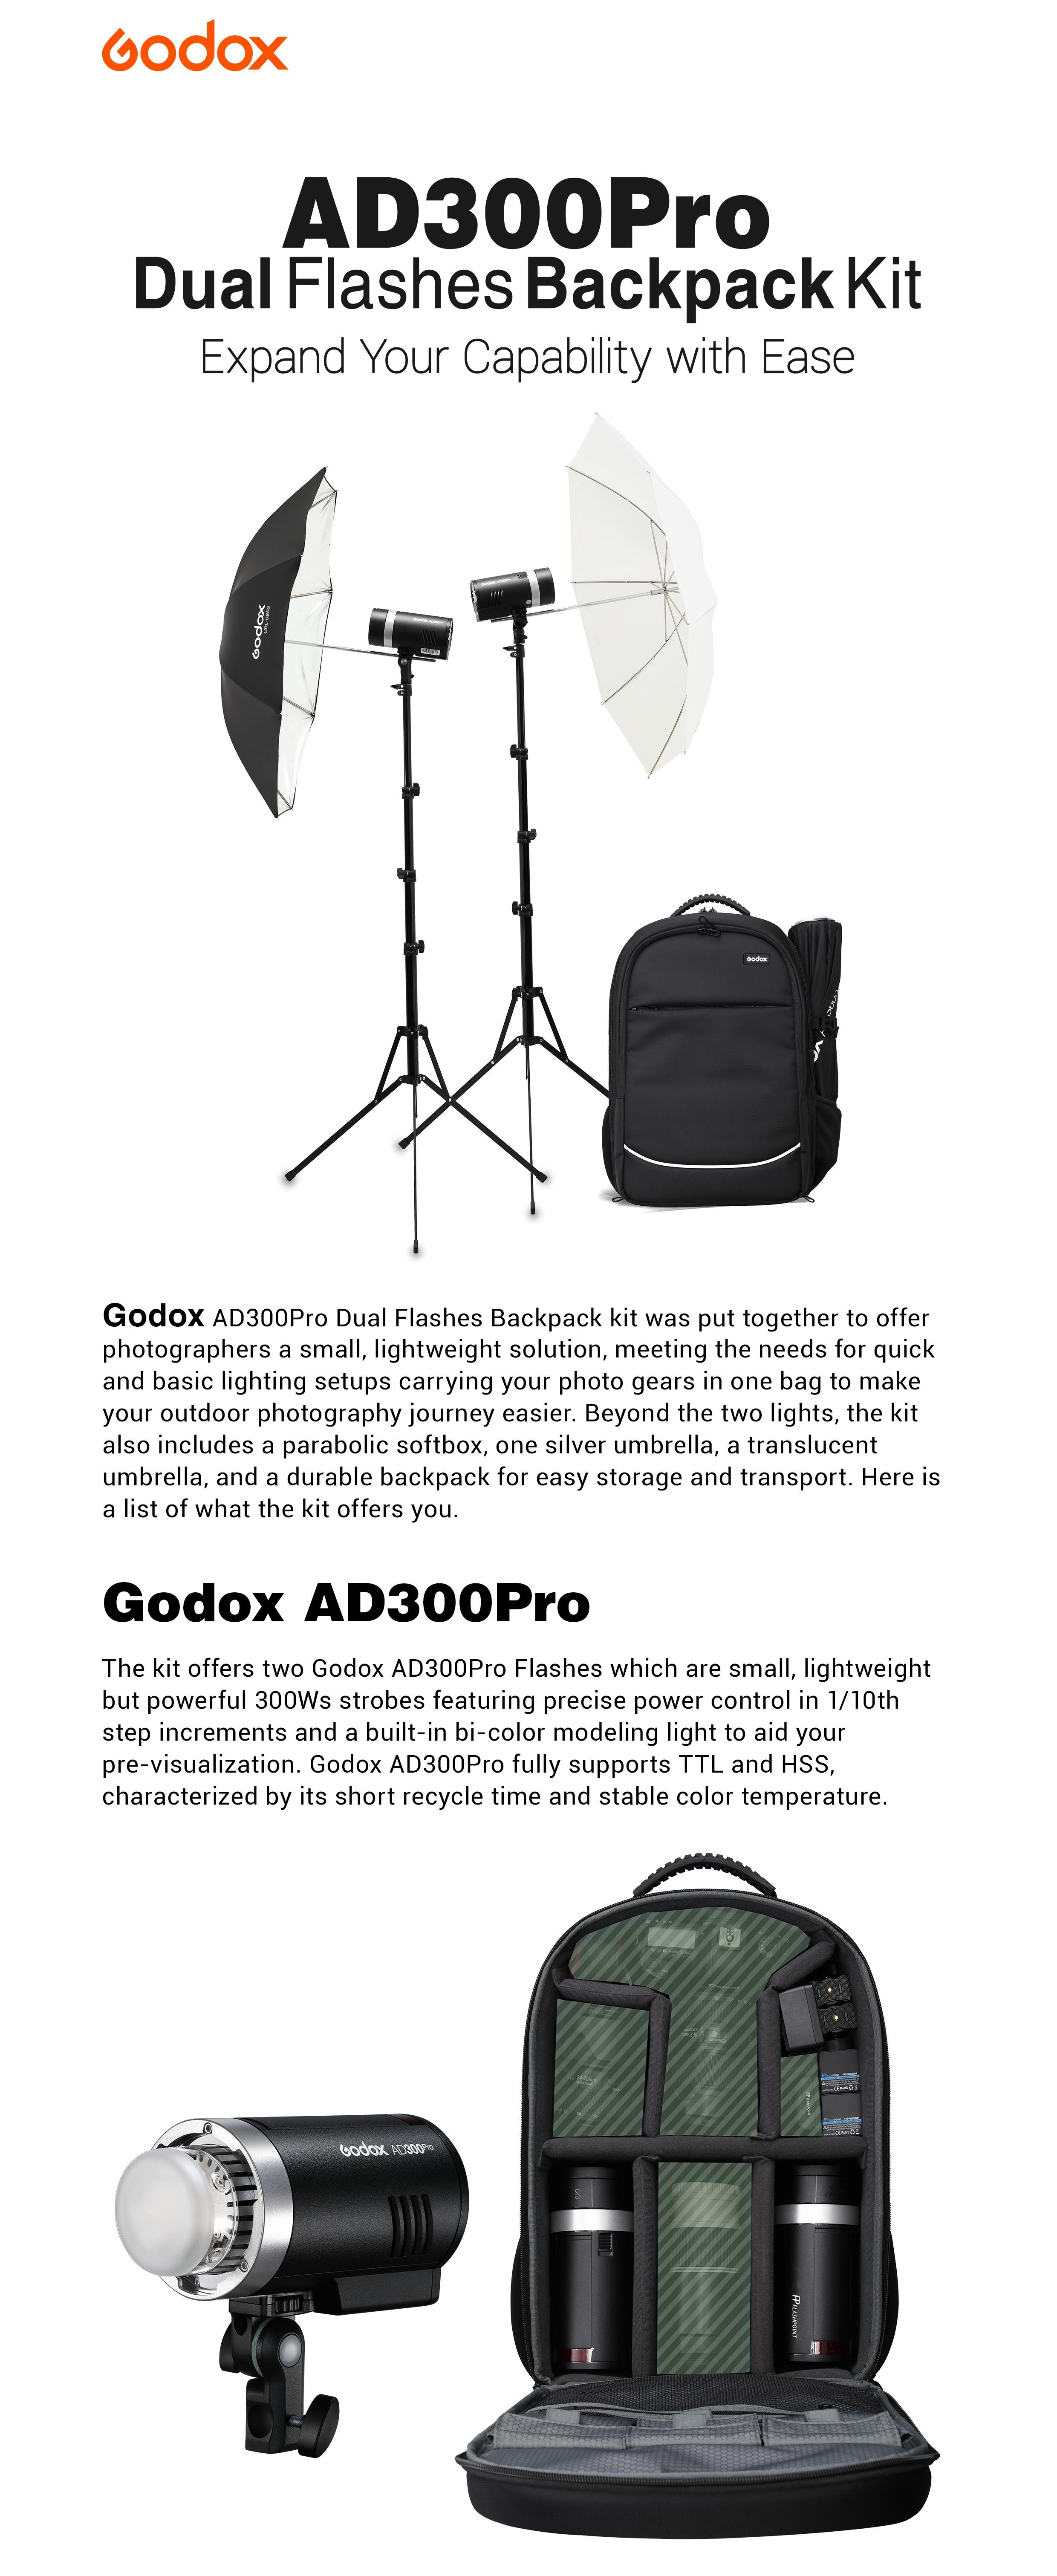 Godox AD300Pro Dual Flashes Backpack Kit. Expand Your Capability. Godox AD300Pro.